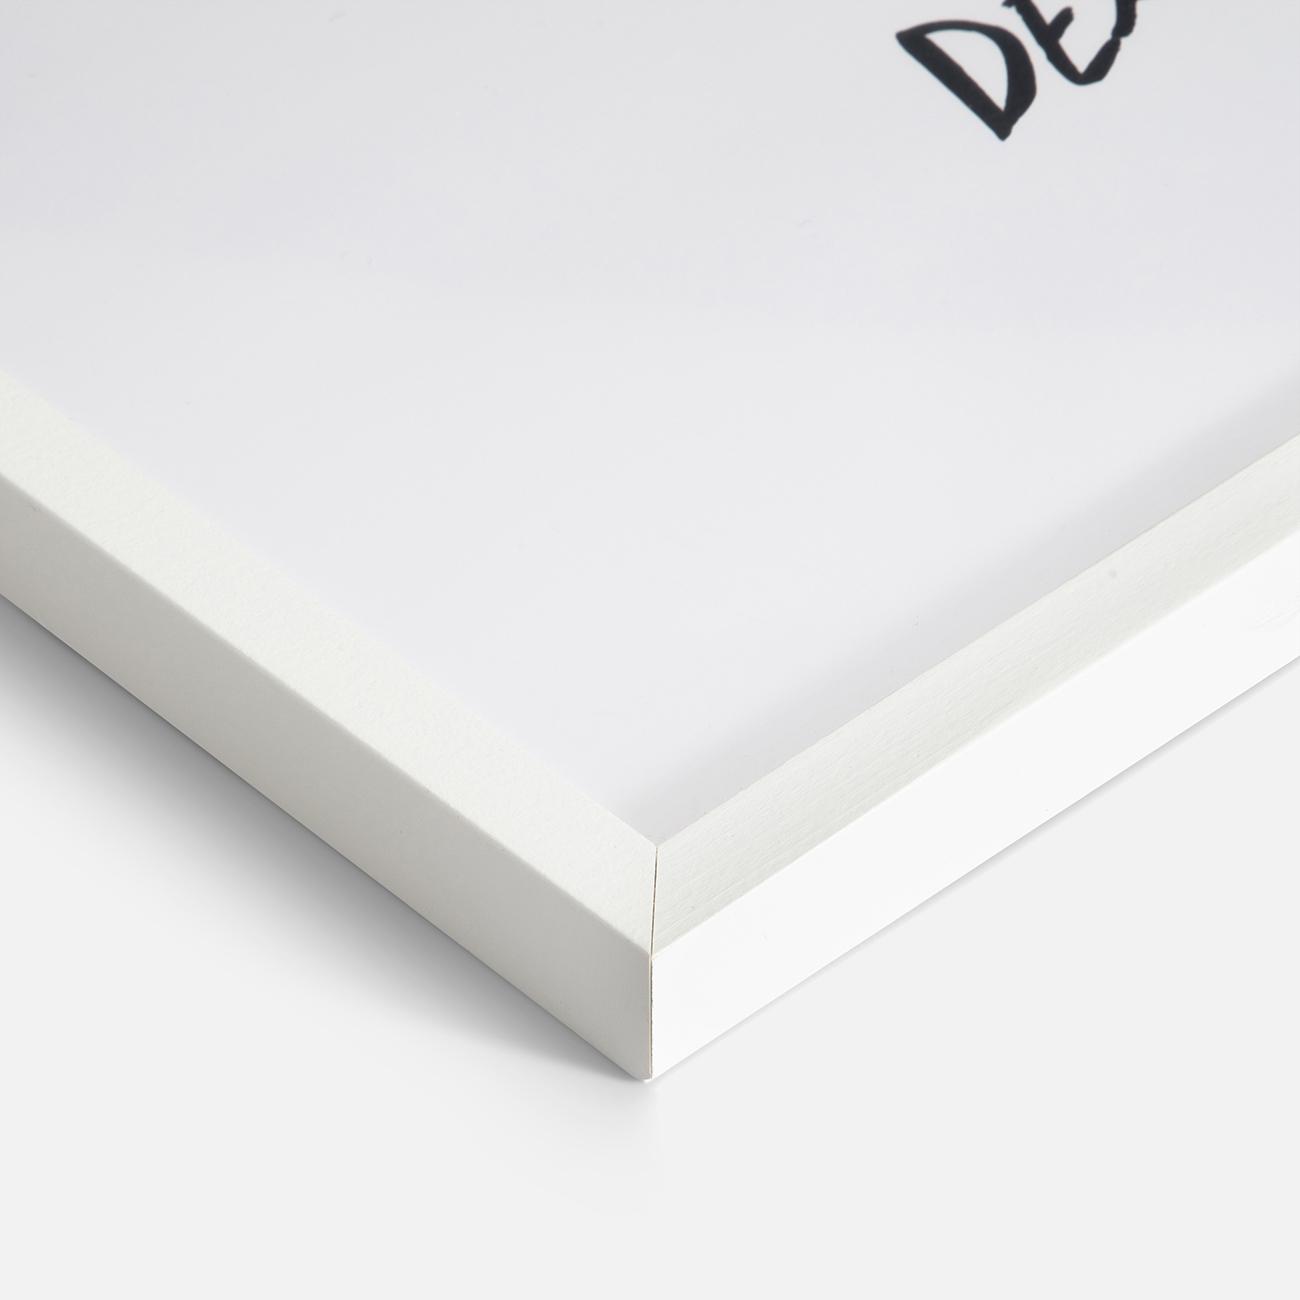 front-produktfoto-dearsam-3